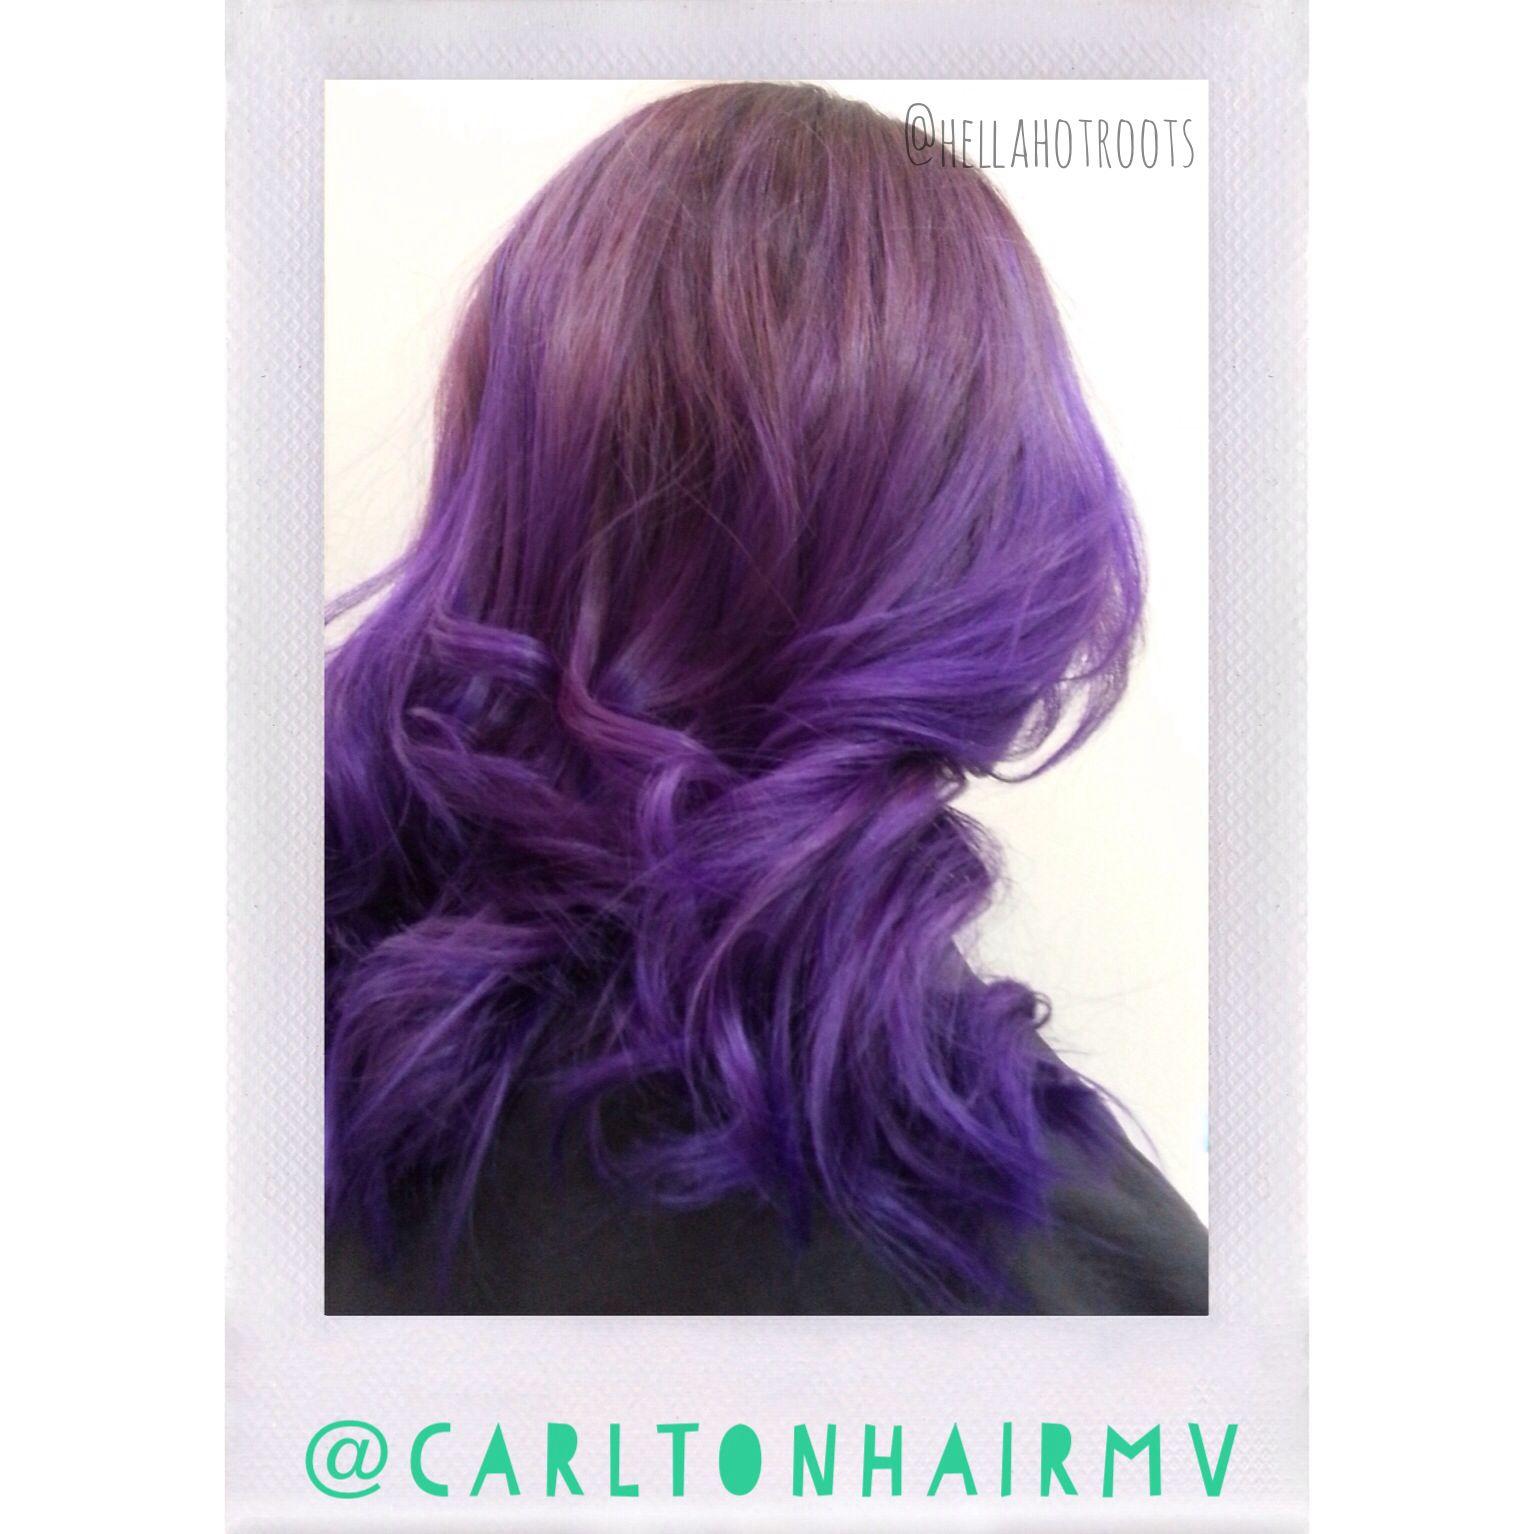 #purps #purpleombre | by Sr. Stylist & Master Educator, Megan, fr: Carlton Hair Mission Viejo | 949-365-1777